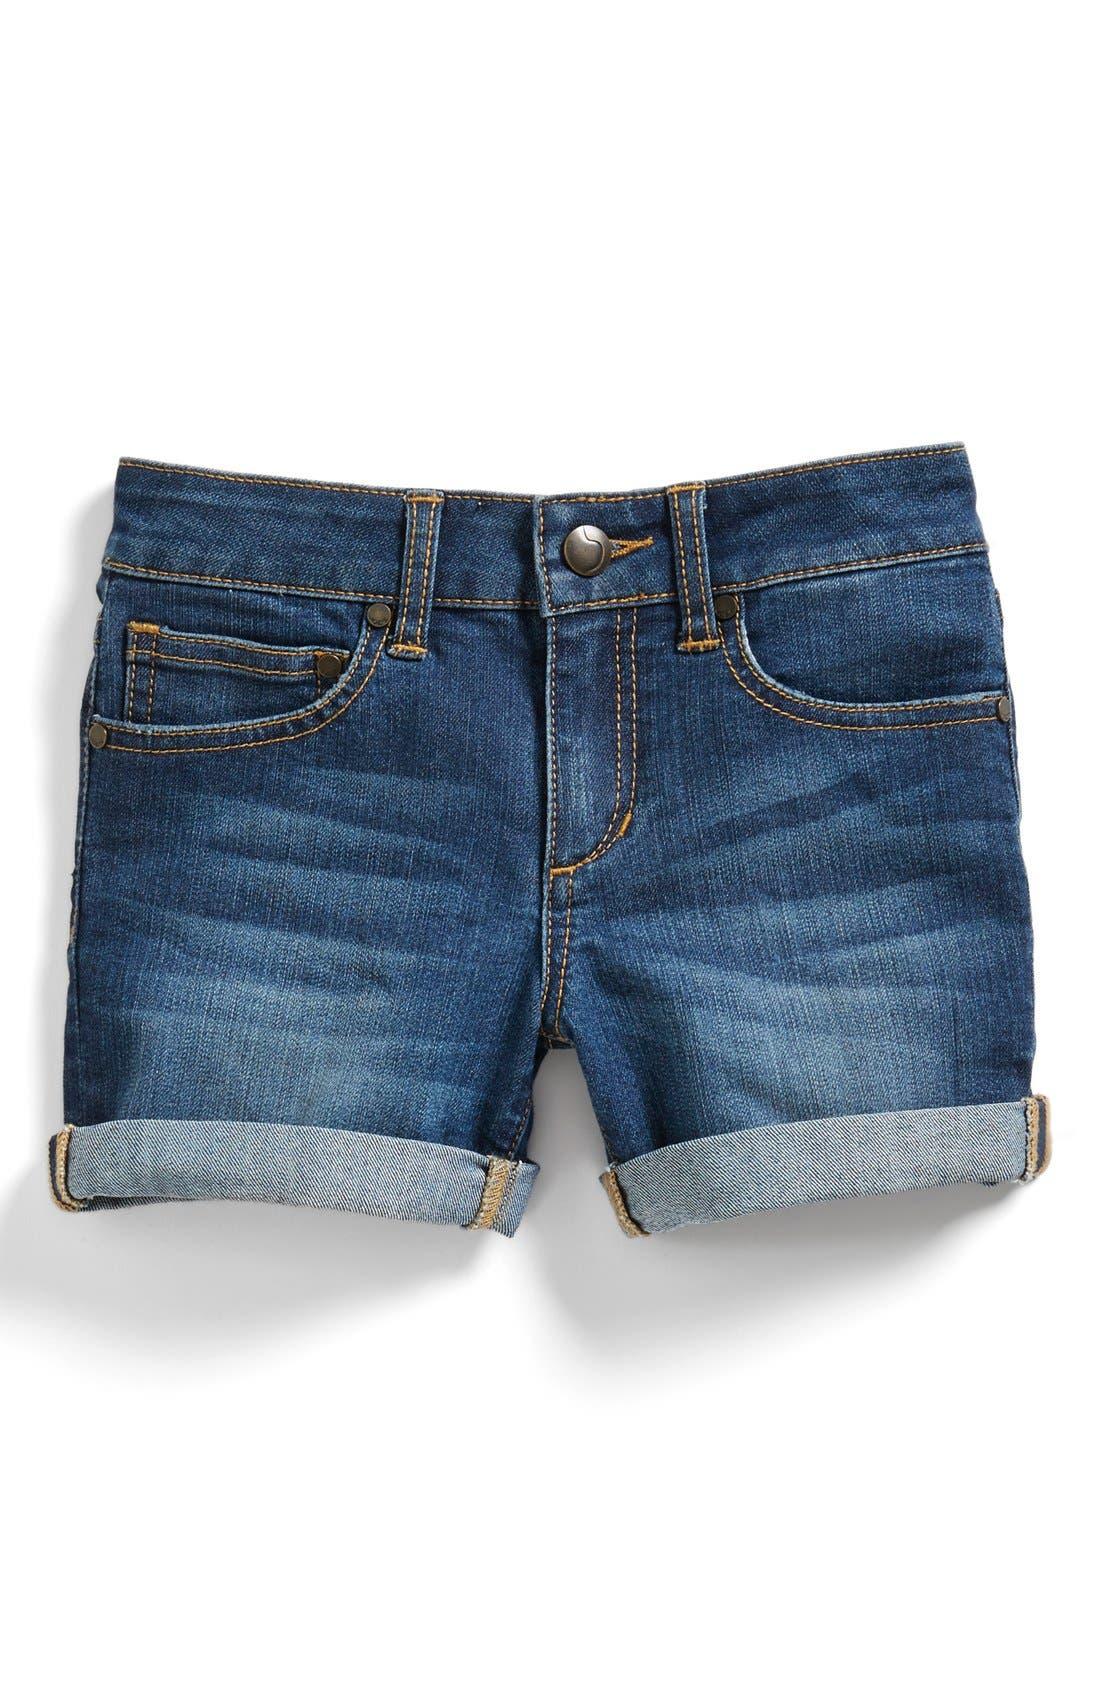 Alternate Image 1 Selected - Joe's Classic Cuff Denim Shorts (Toddler Girls & Little Girls)